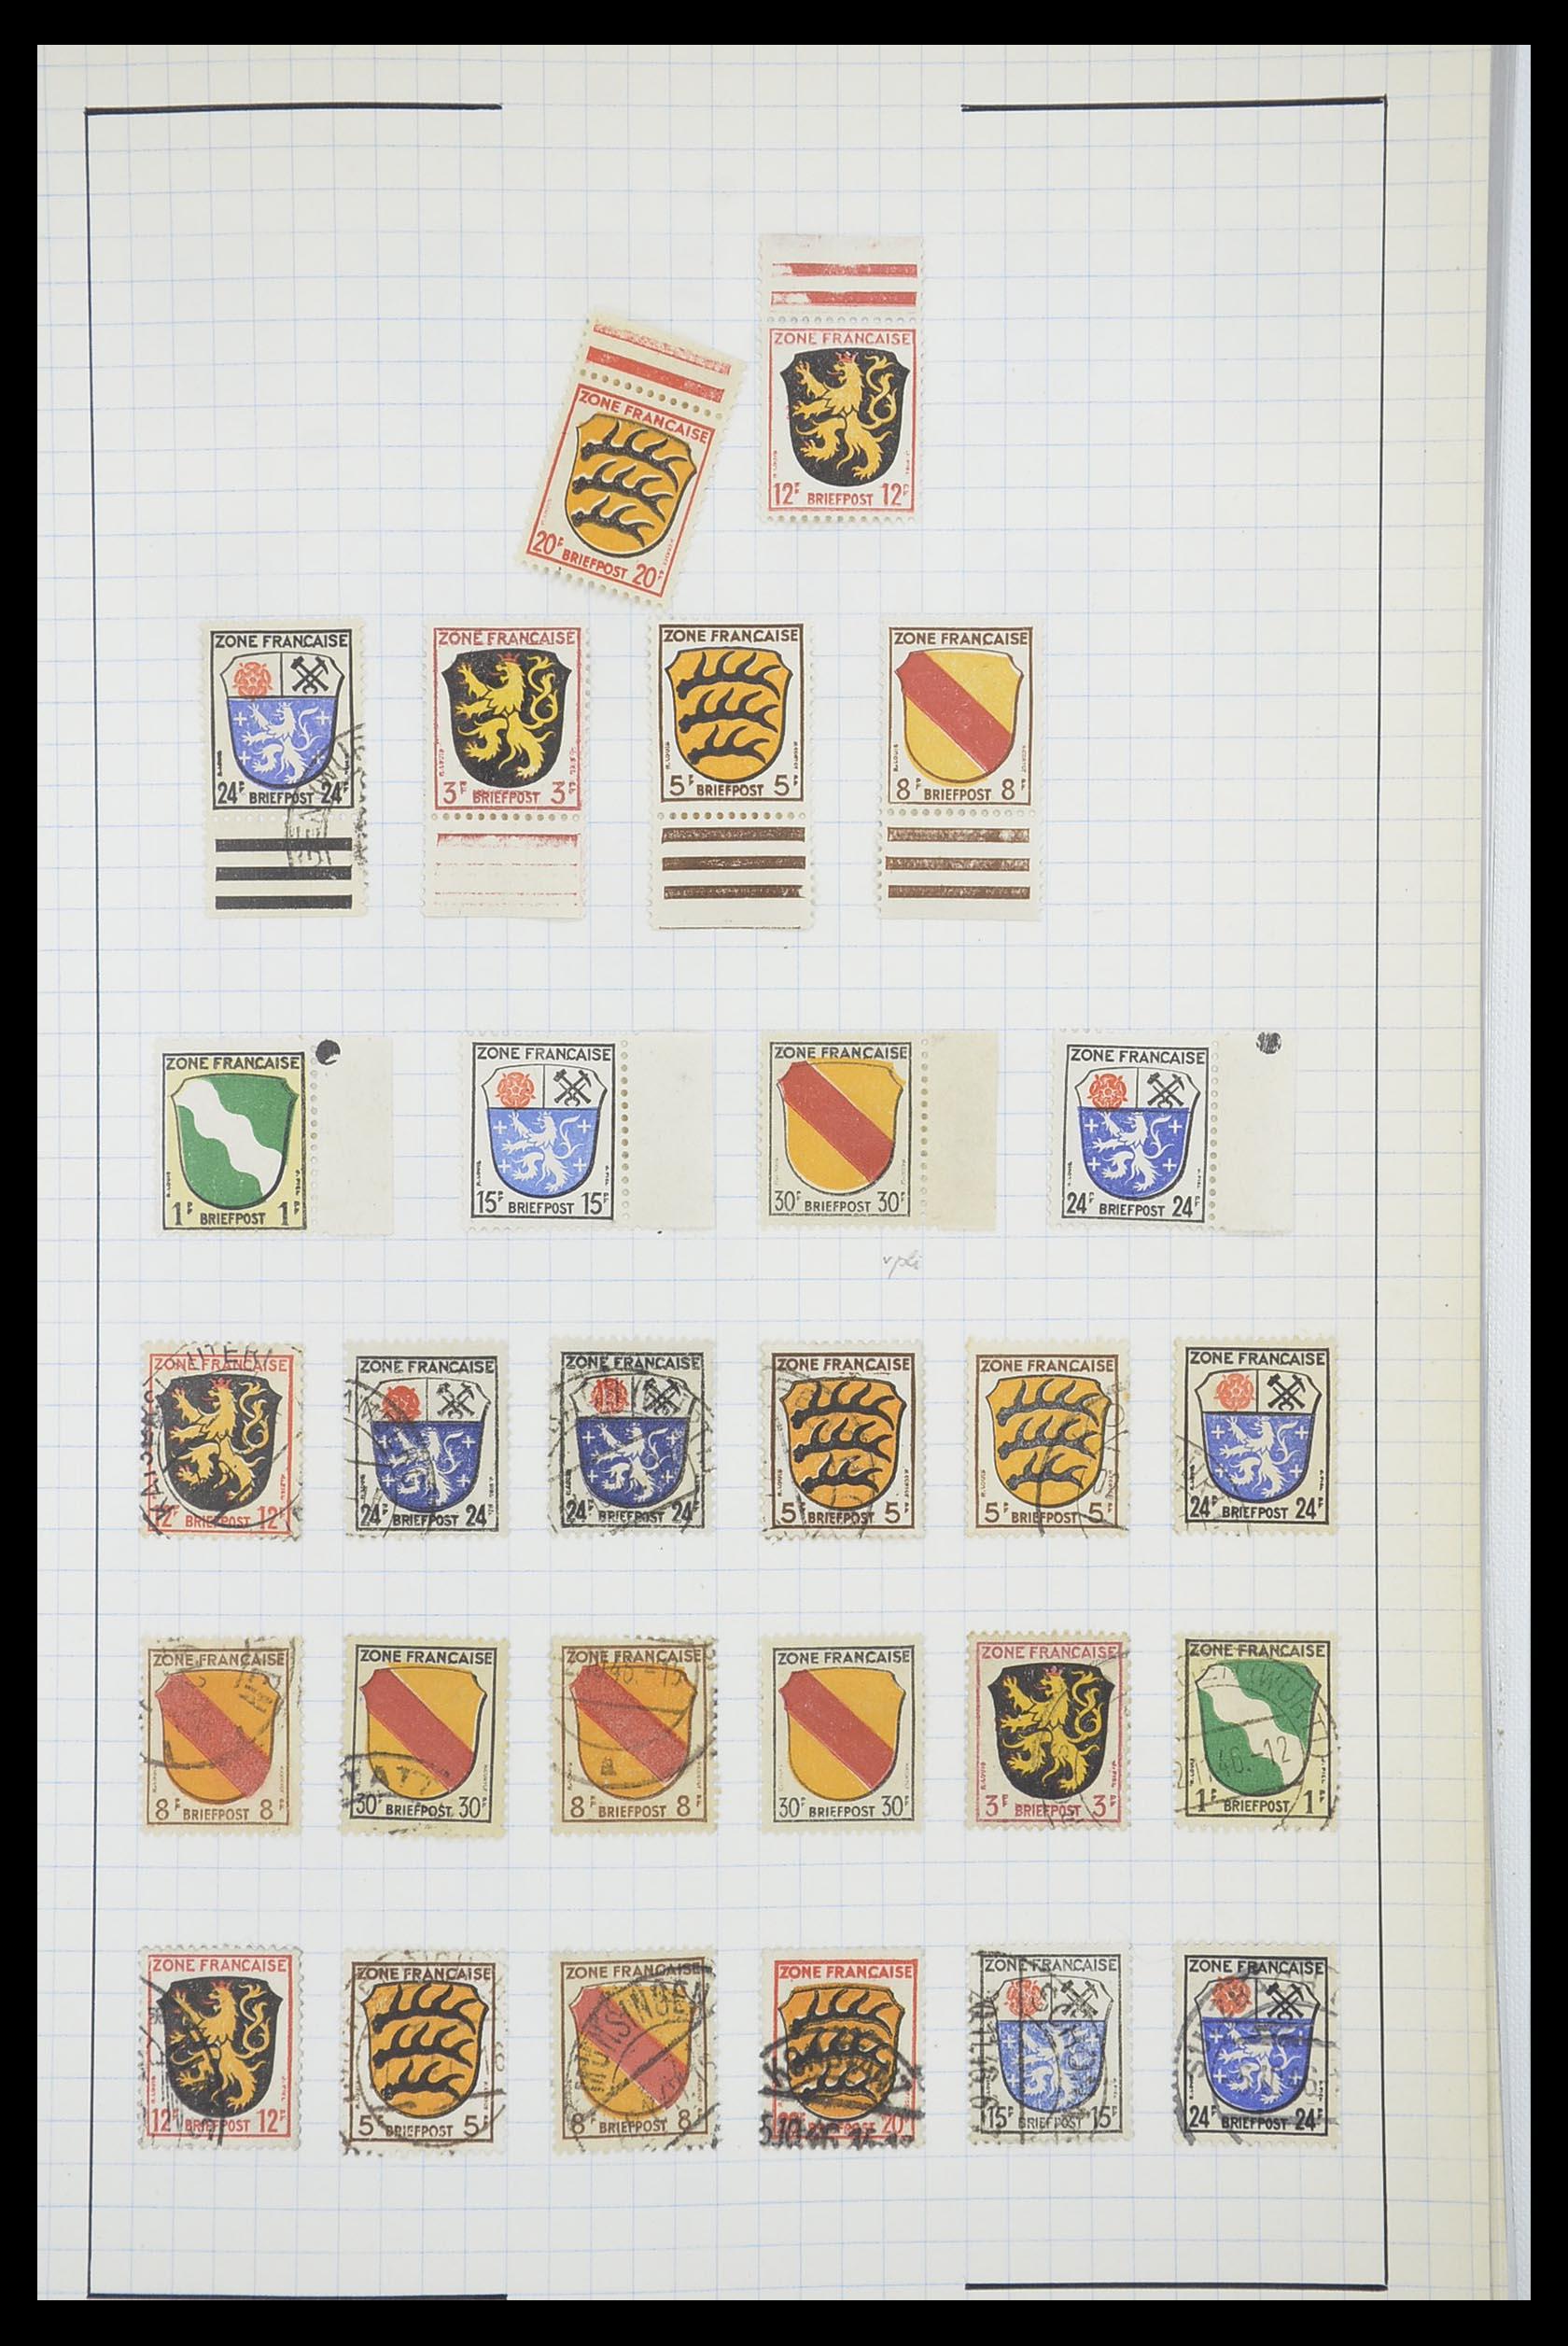 33864 003 - Postzegelverzameling 33864 Franse Zone 1945-1949.